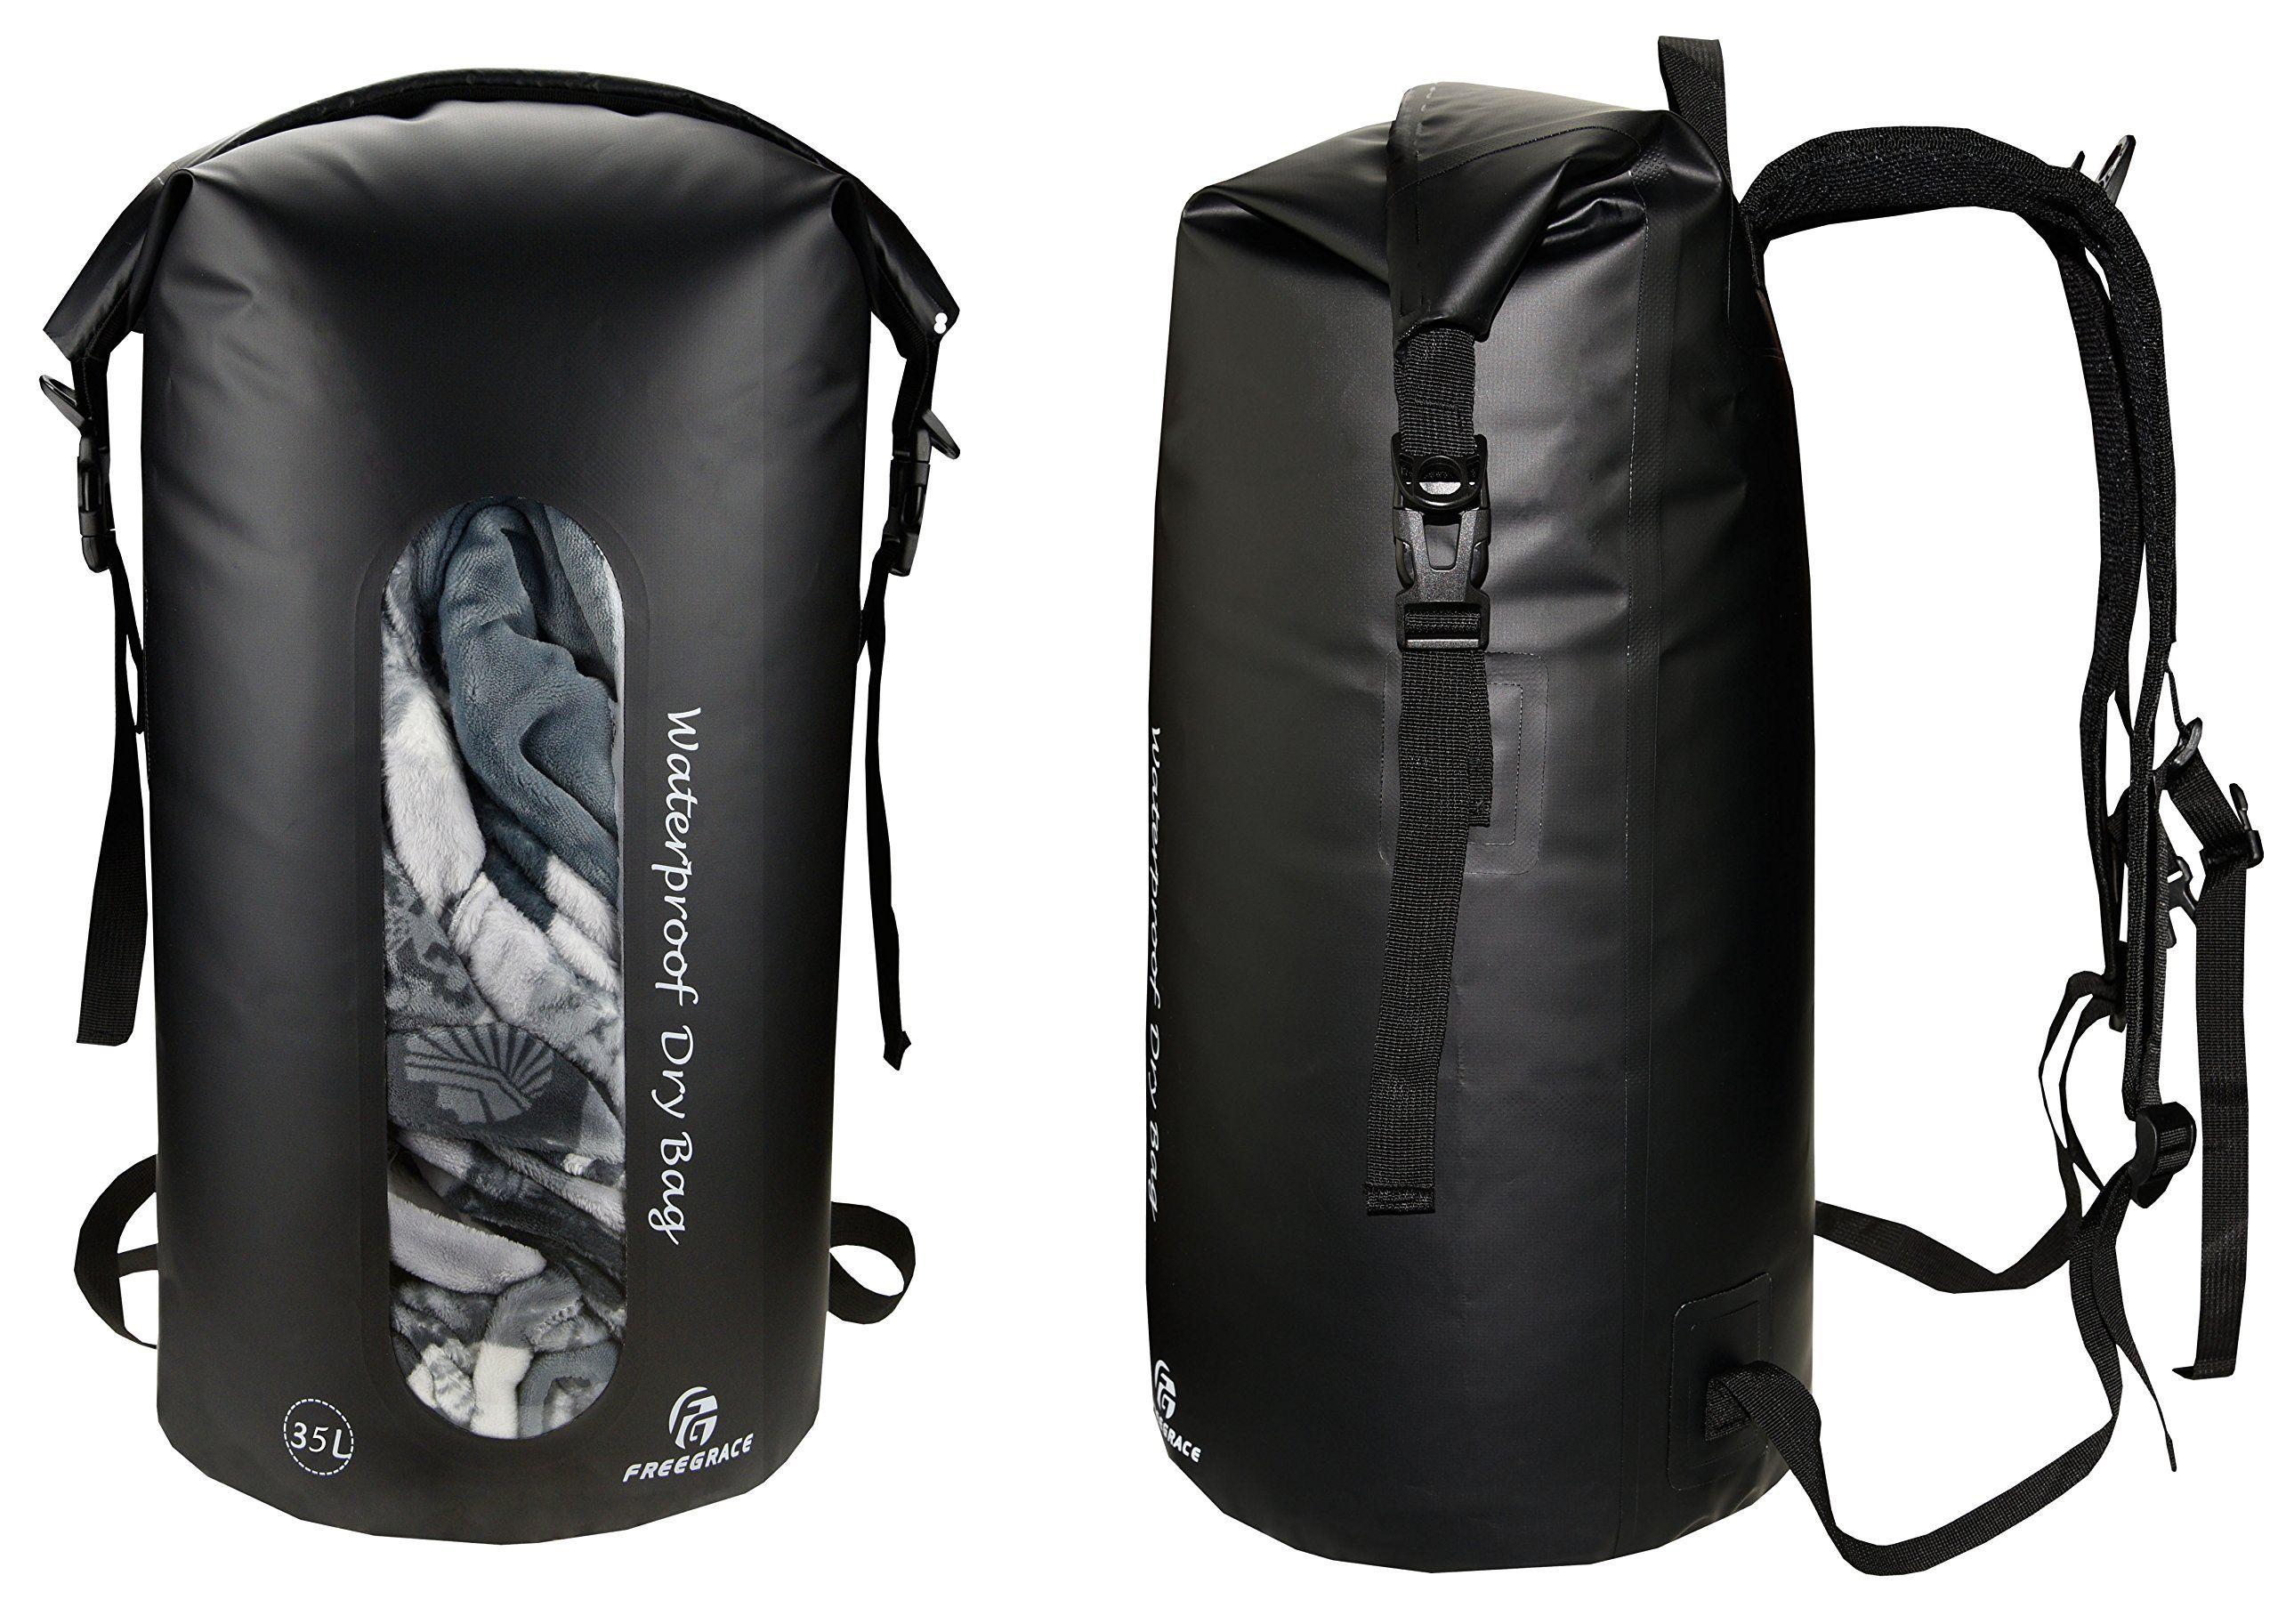 Canoe Storage ** Freegrace Waterproof Dry Bags Set Of 3 By